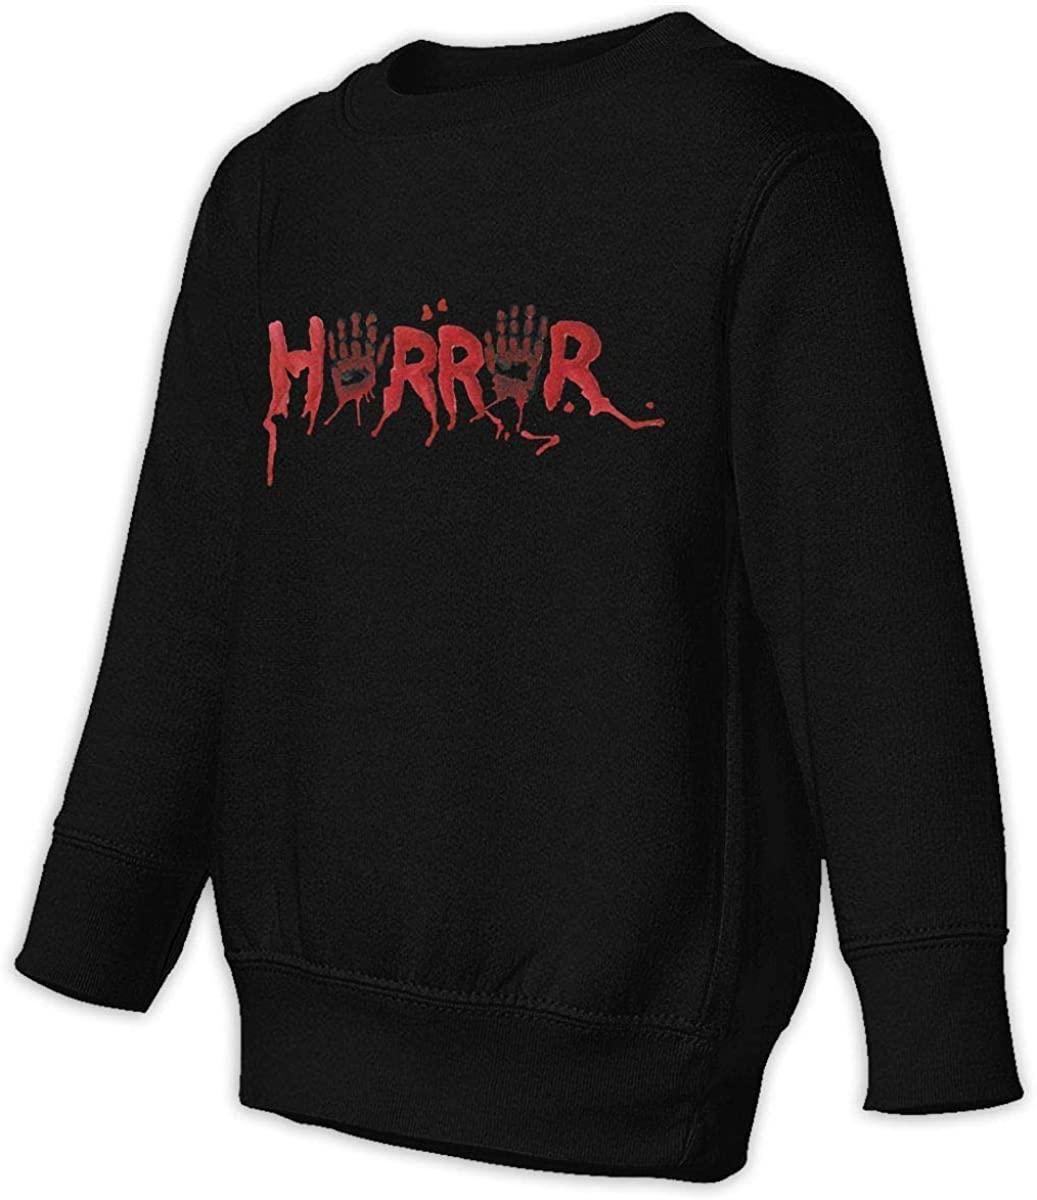 1836 Horror Movie Unisex Sweatshirt Youth Boy and Girls Pullover Sweatshirt 2t Black